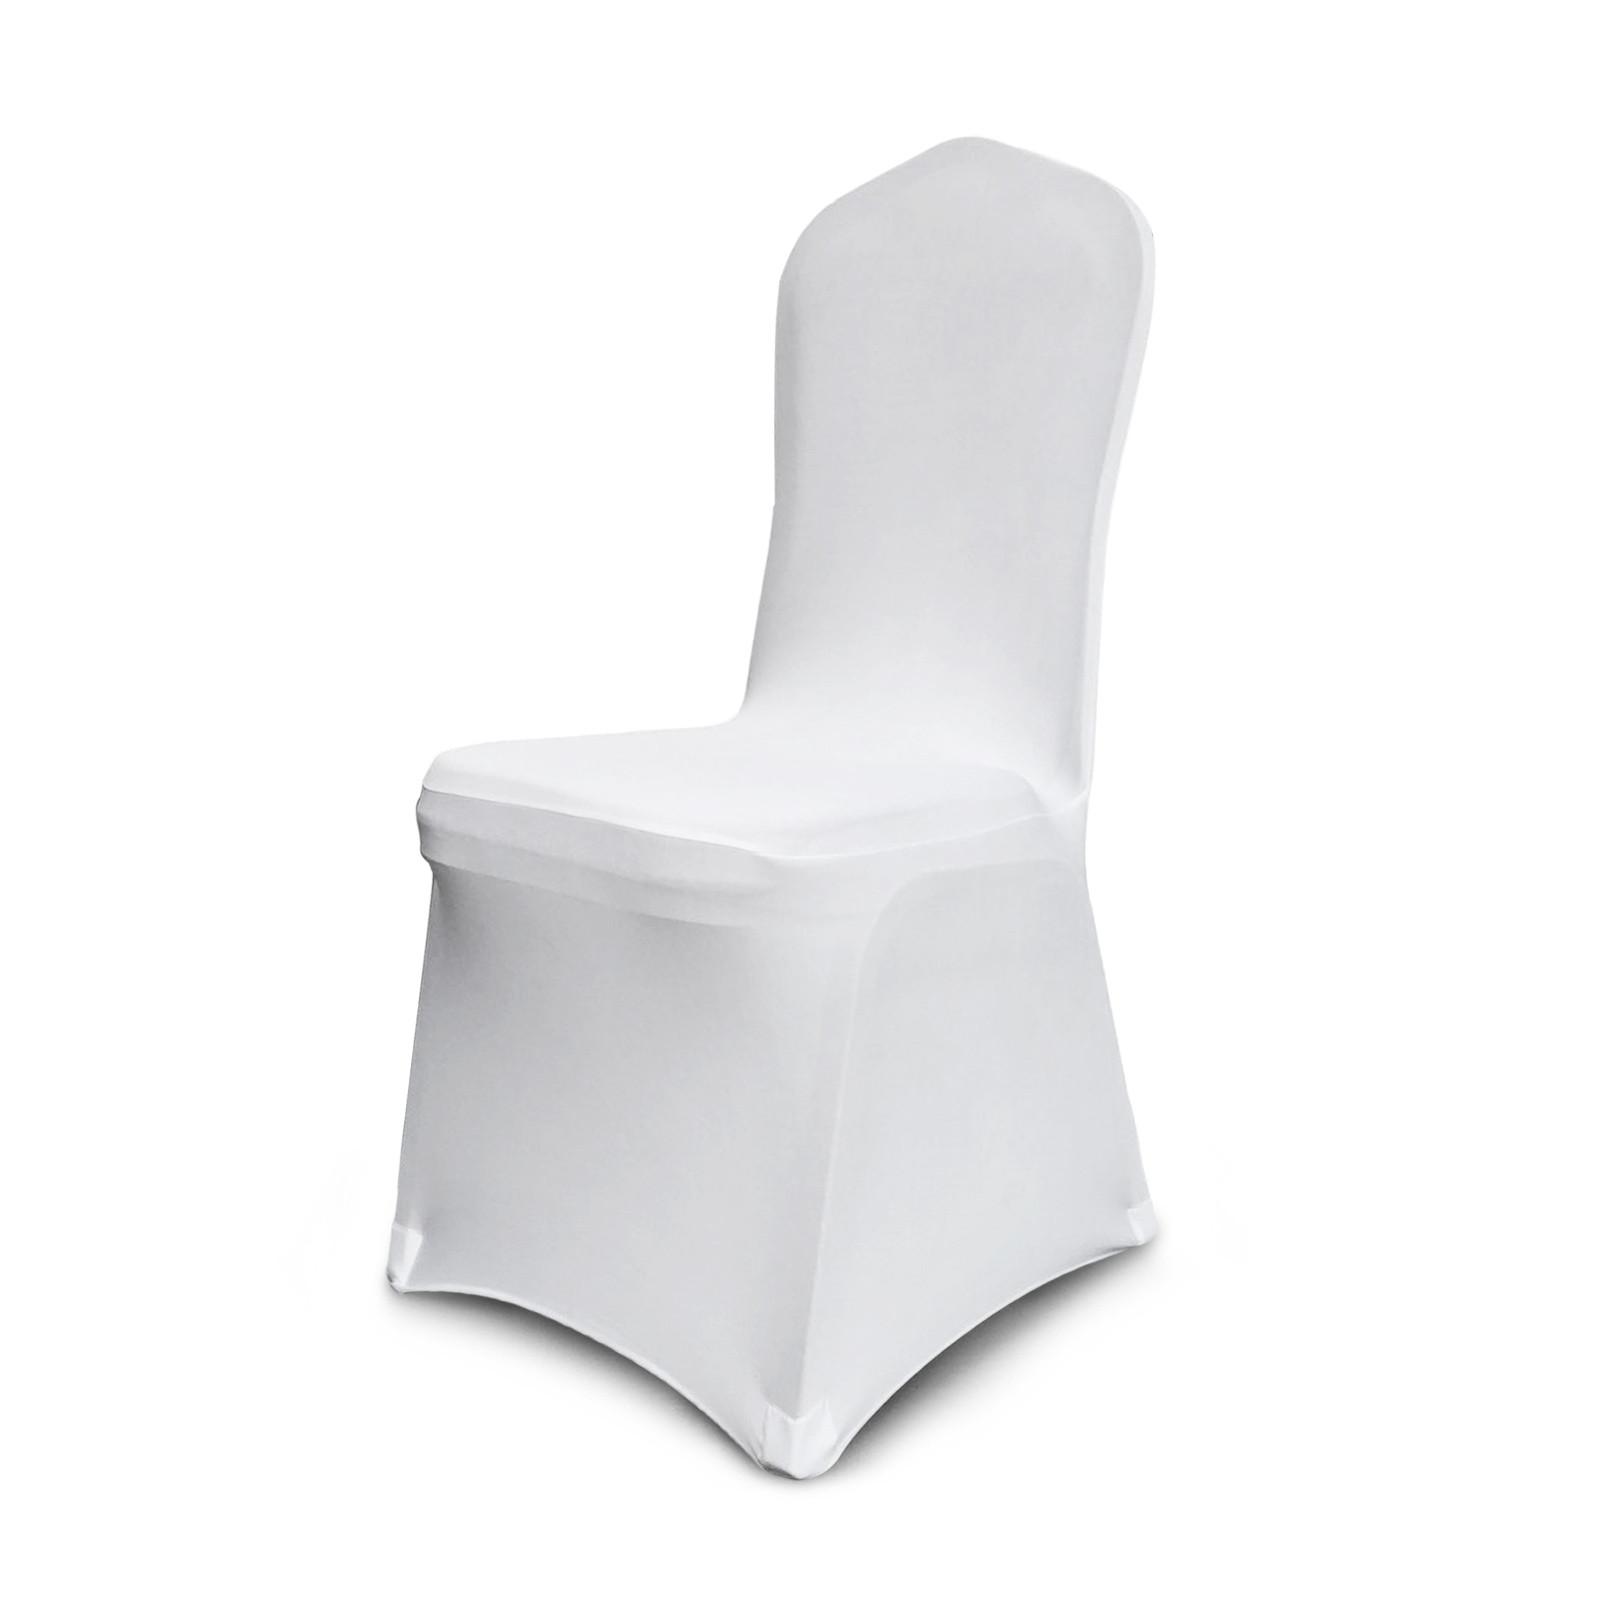 100X Stuhlhussen Stretch Stuhlbezug Stuhlüberzug Reinheit Neu Universal